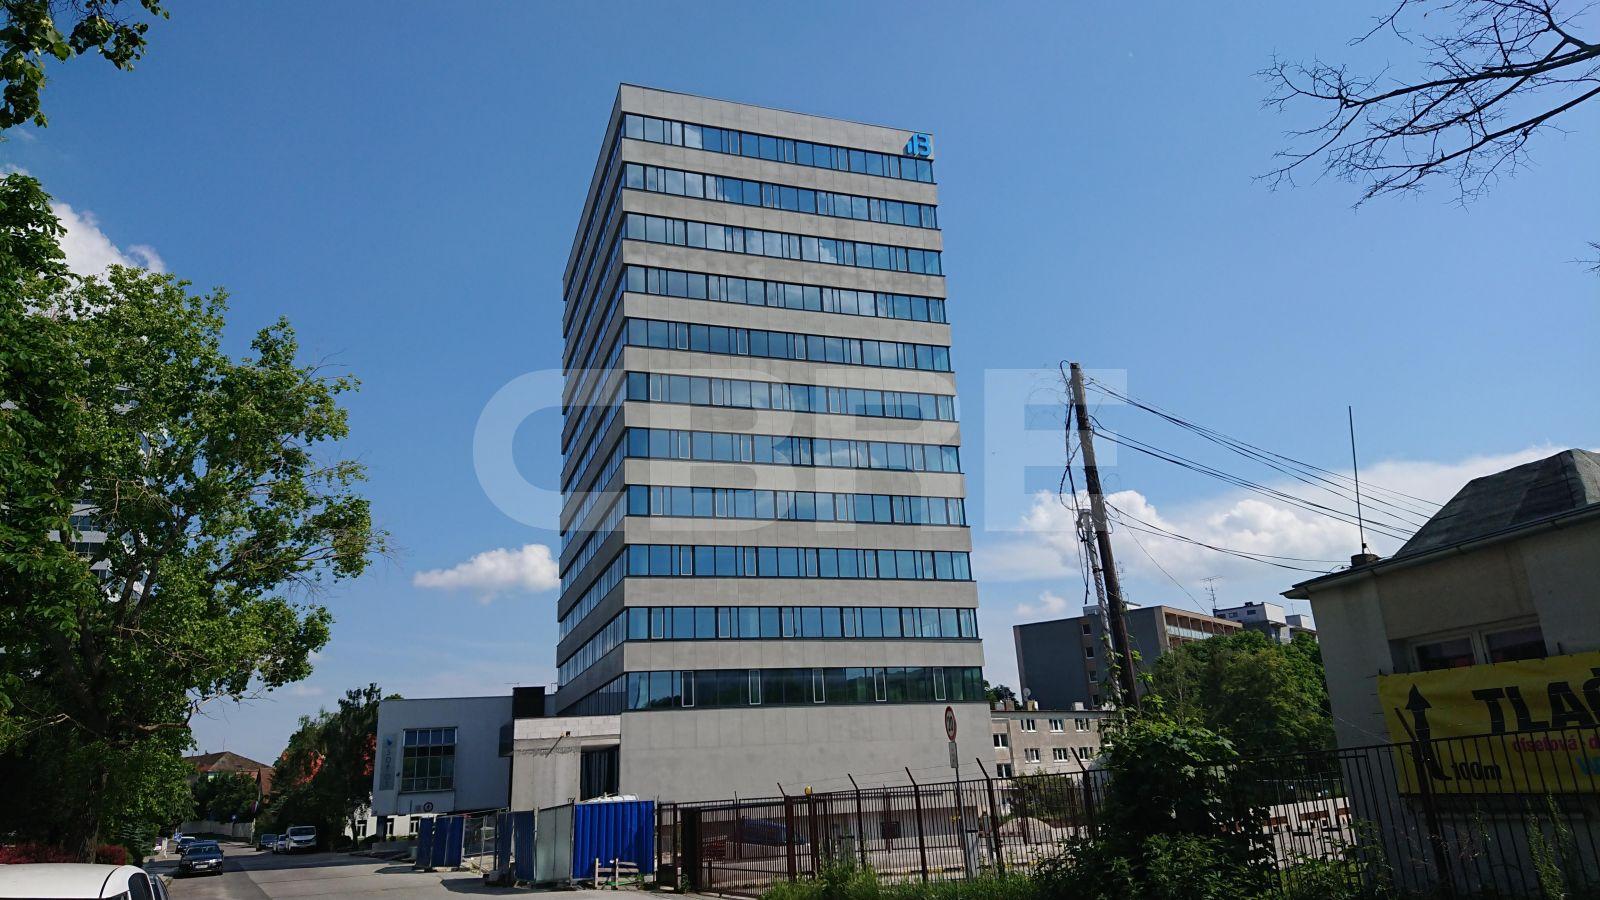 Blumenau, Bratislava - Karlova Ves | Offices for rent by CBRE | 1